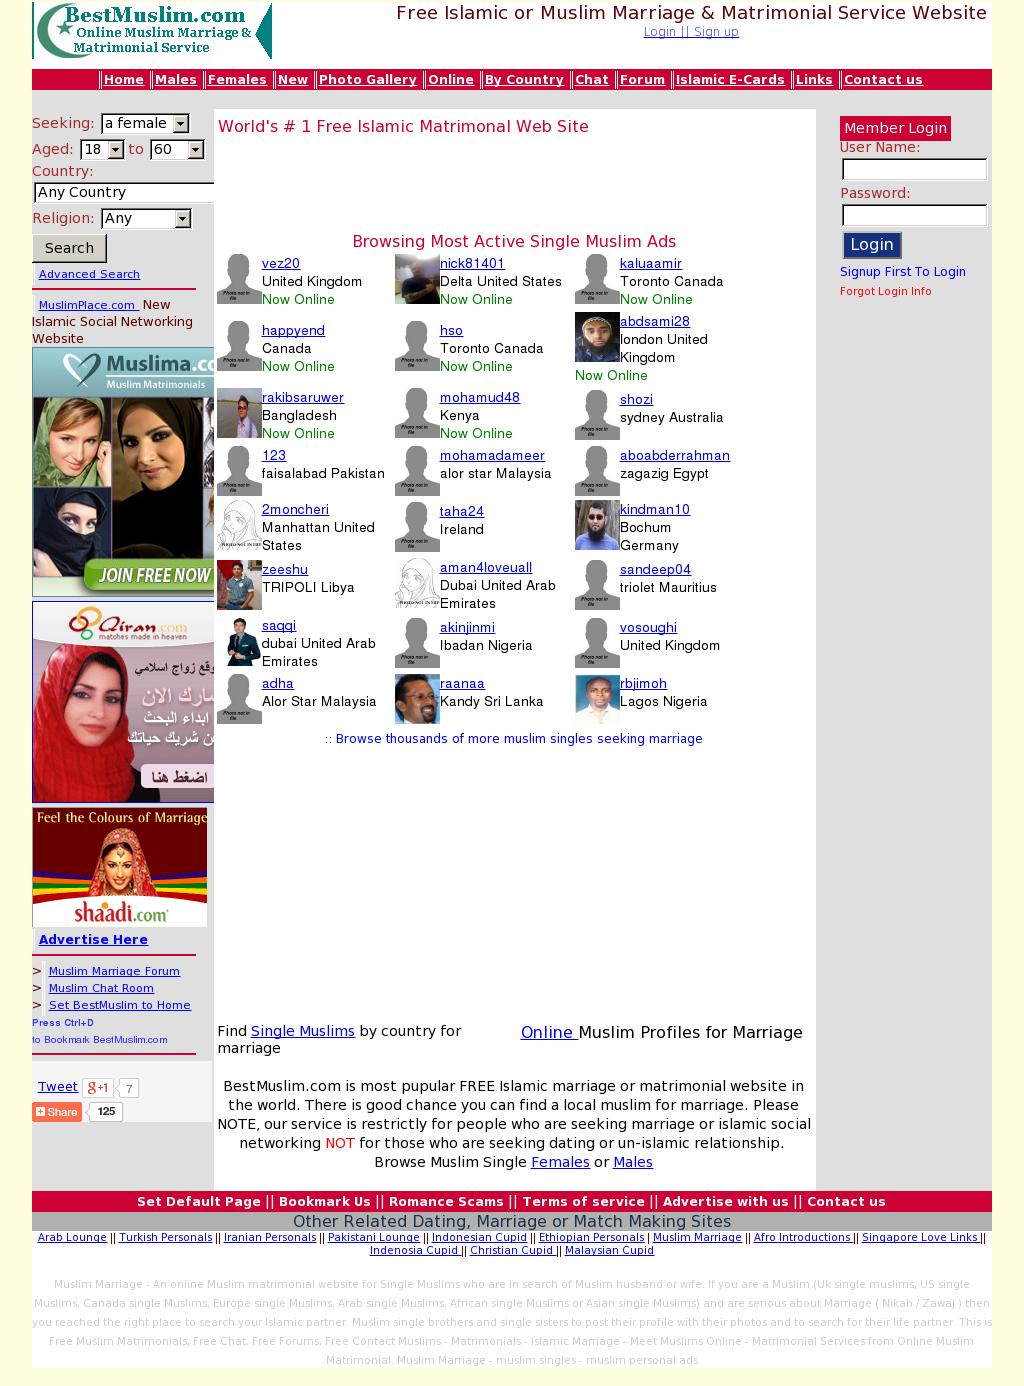 Bestmuslim Free Muslim Marriage Competitors, Revenue and Employees